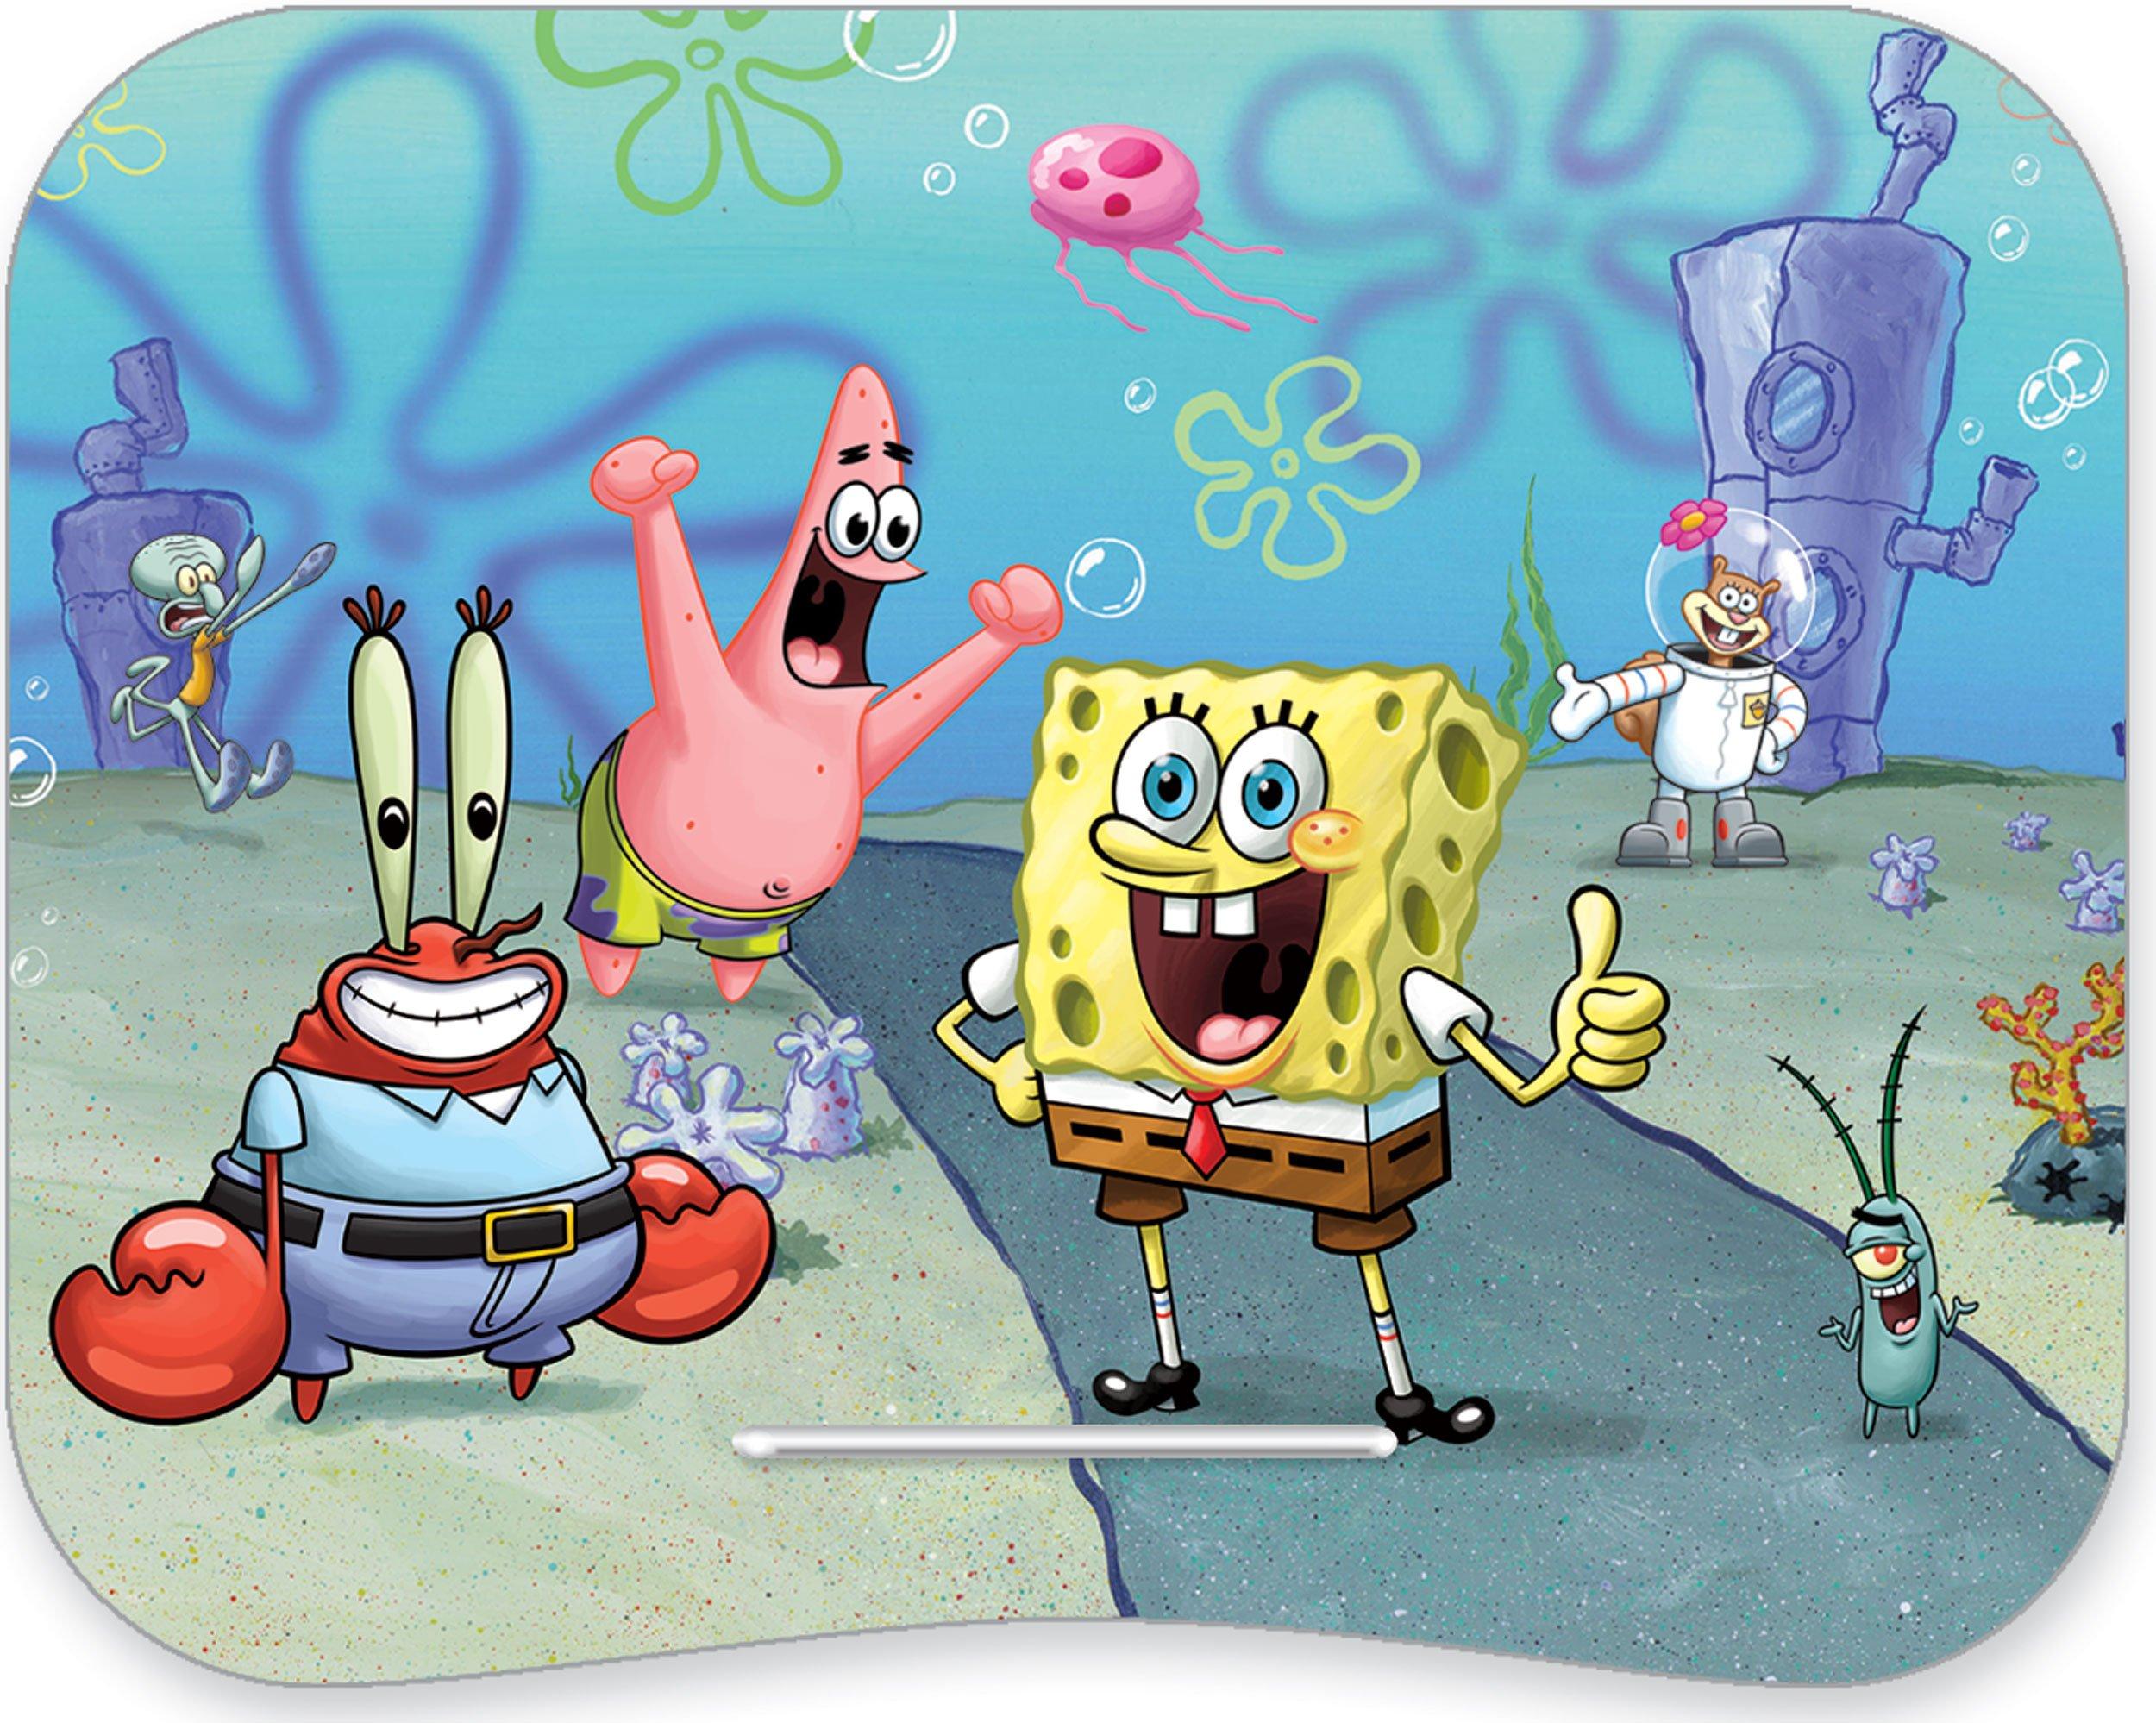 game spongebob 220x176